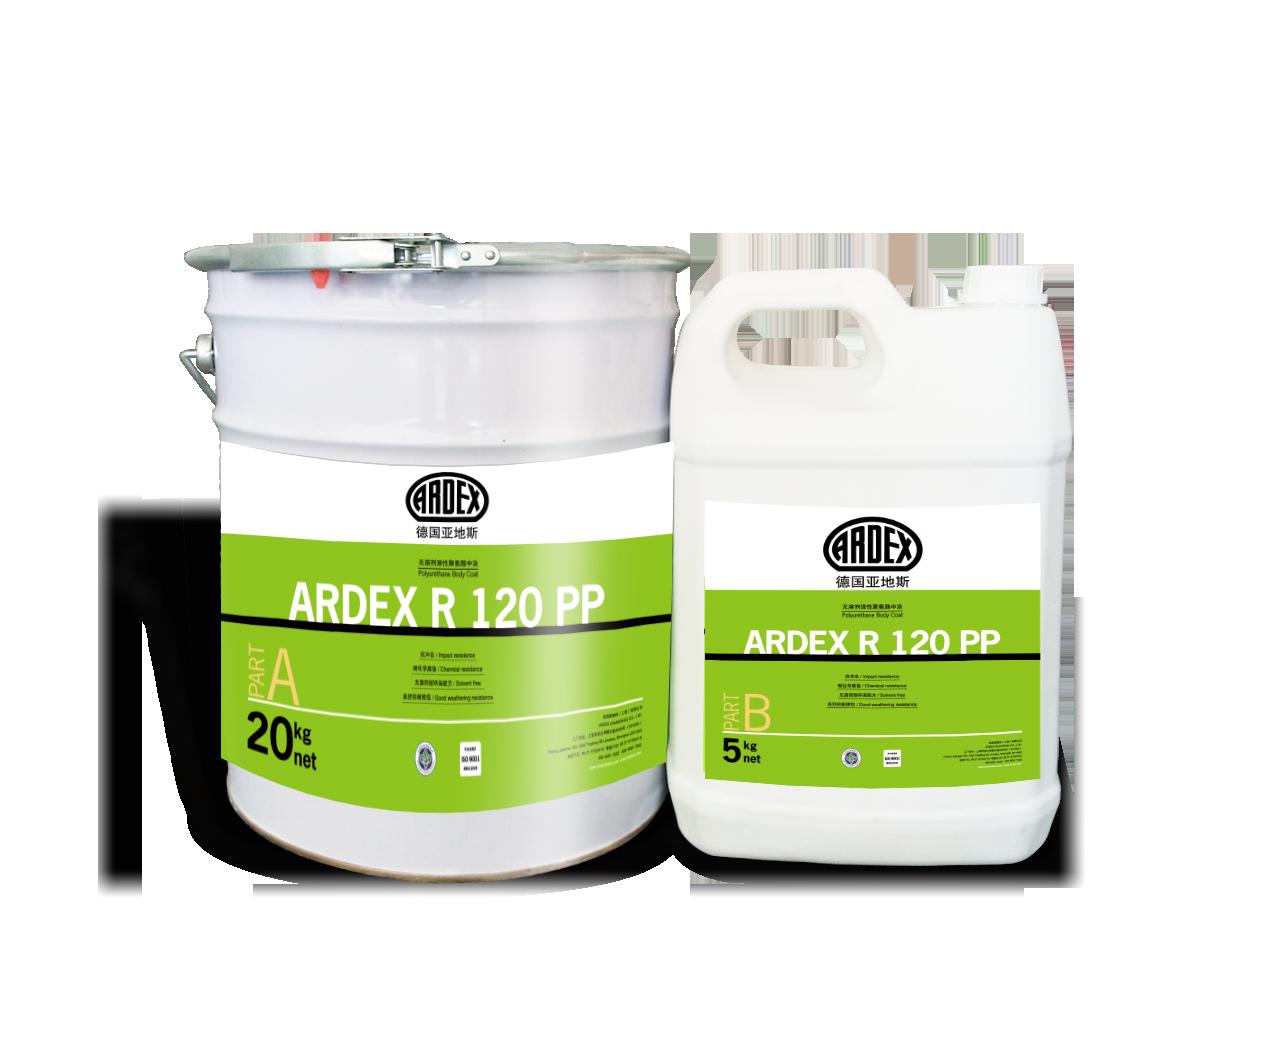 ARDEX R 120 PP